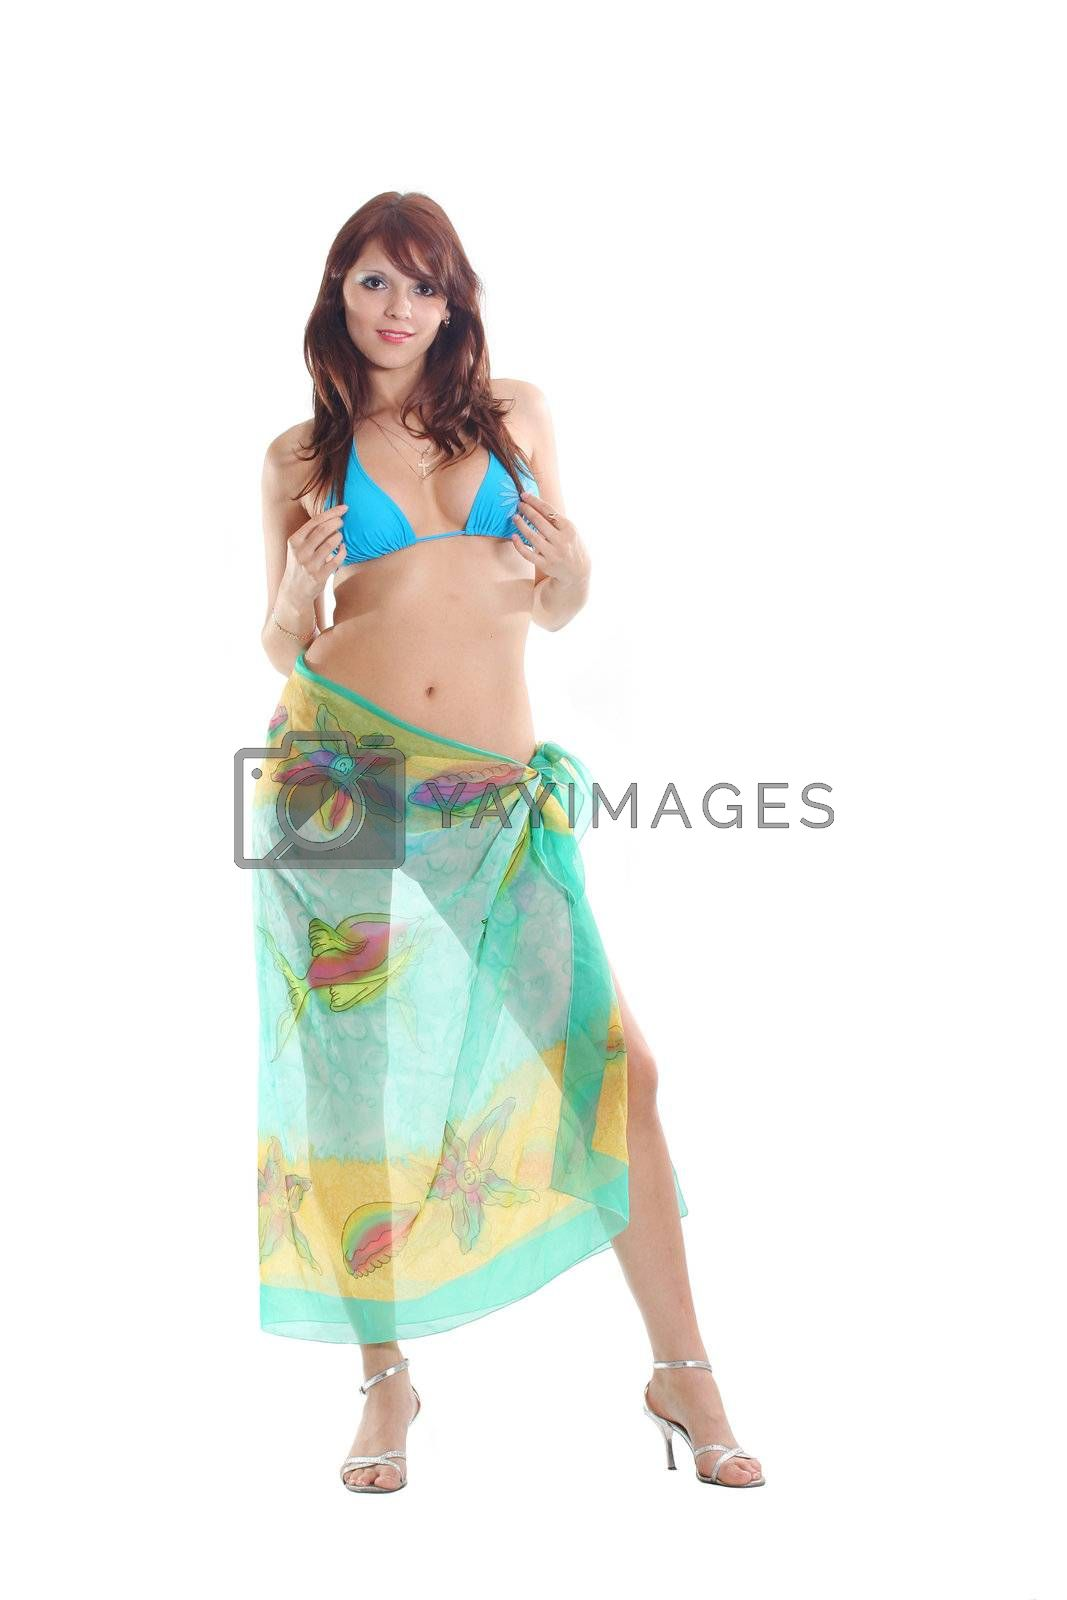 bikini body human women beauty attractive isolated